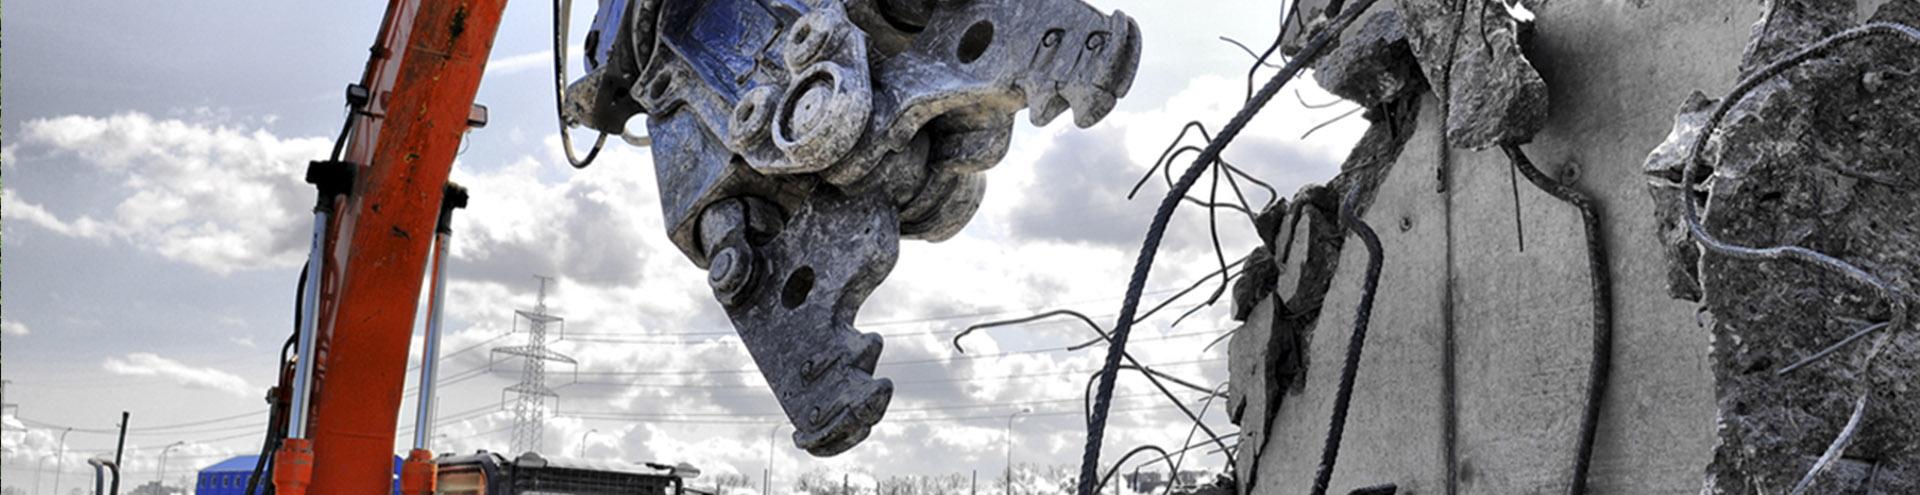 право на самовольную постройку в Чебоксарах